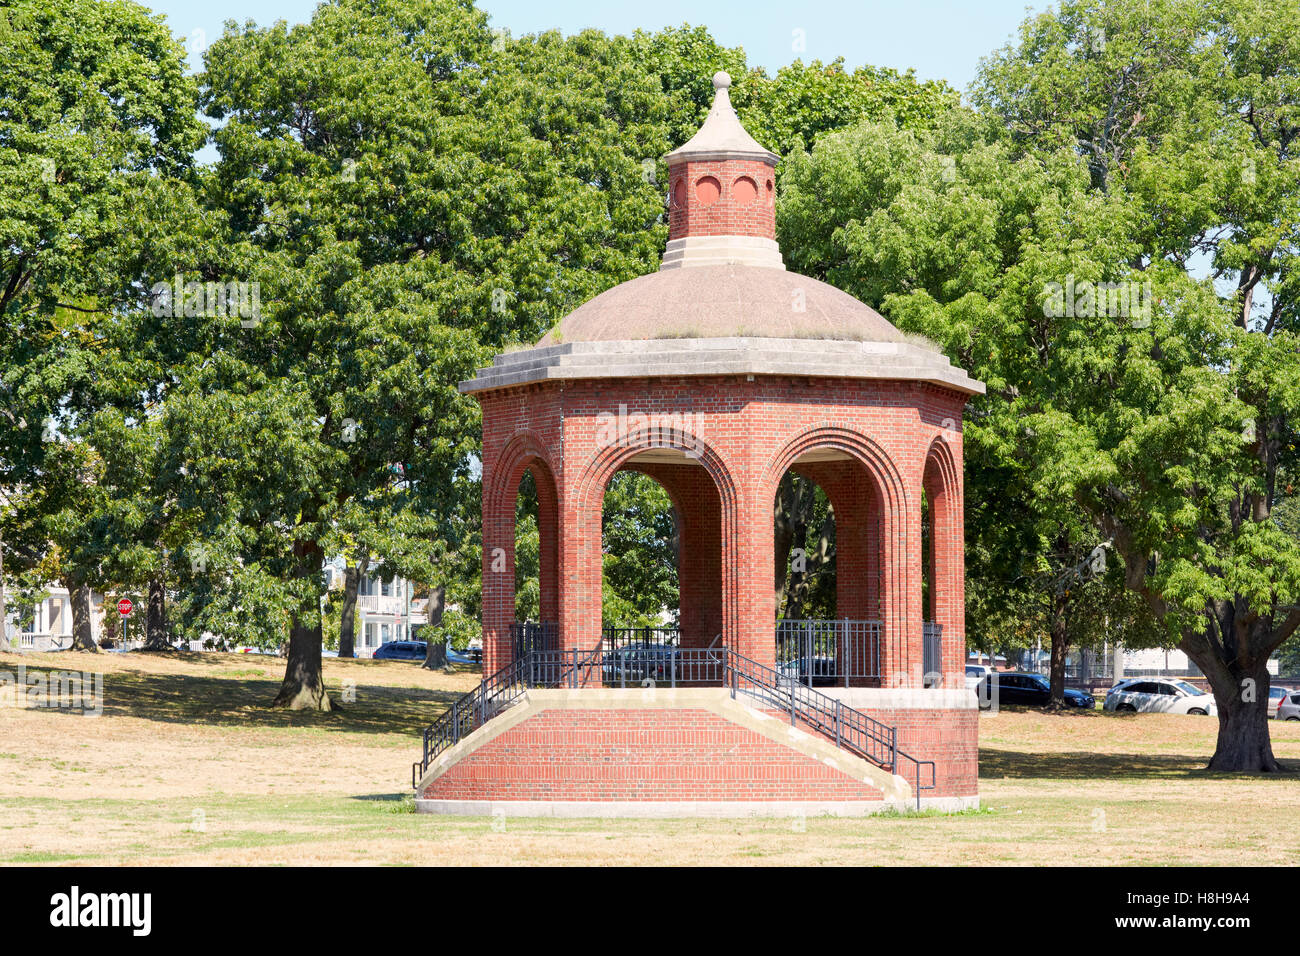 Band stand gazebo, City Point Park, South Boston, Massachusetts, USA - Stock Image